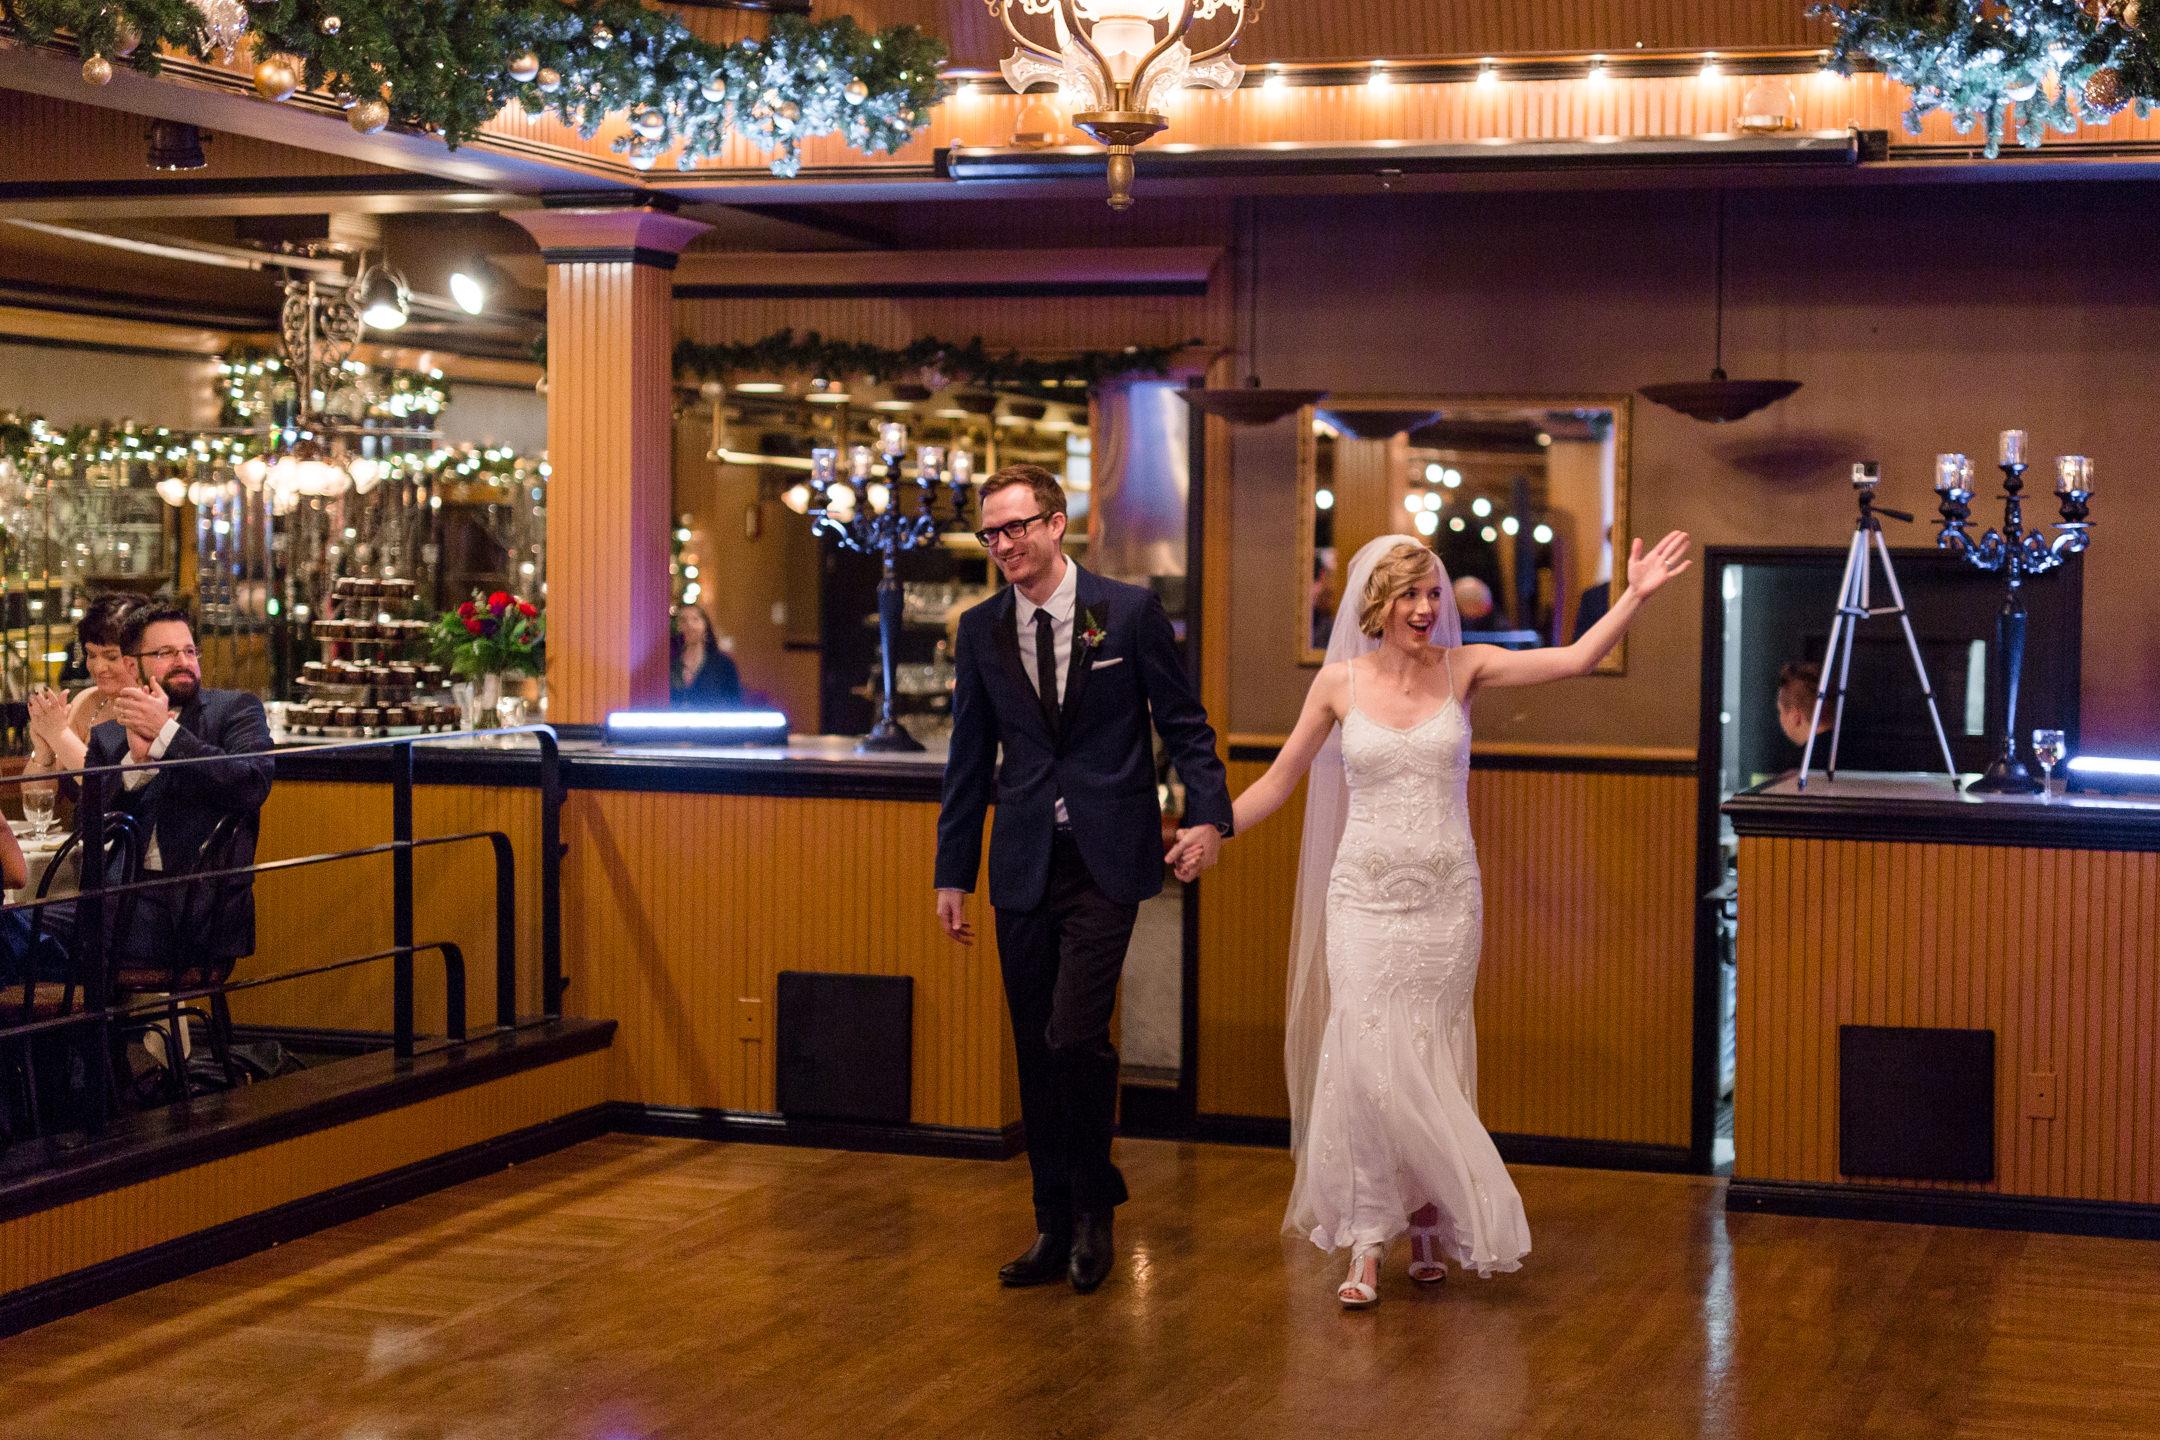 Documentary-Wedding-Photography-Andrew-Tat-Gabi & Kim-26.jpg